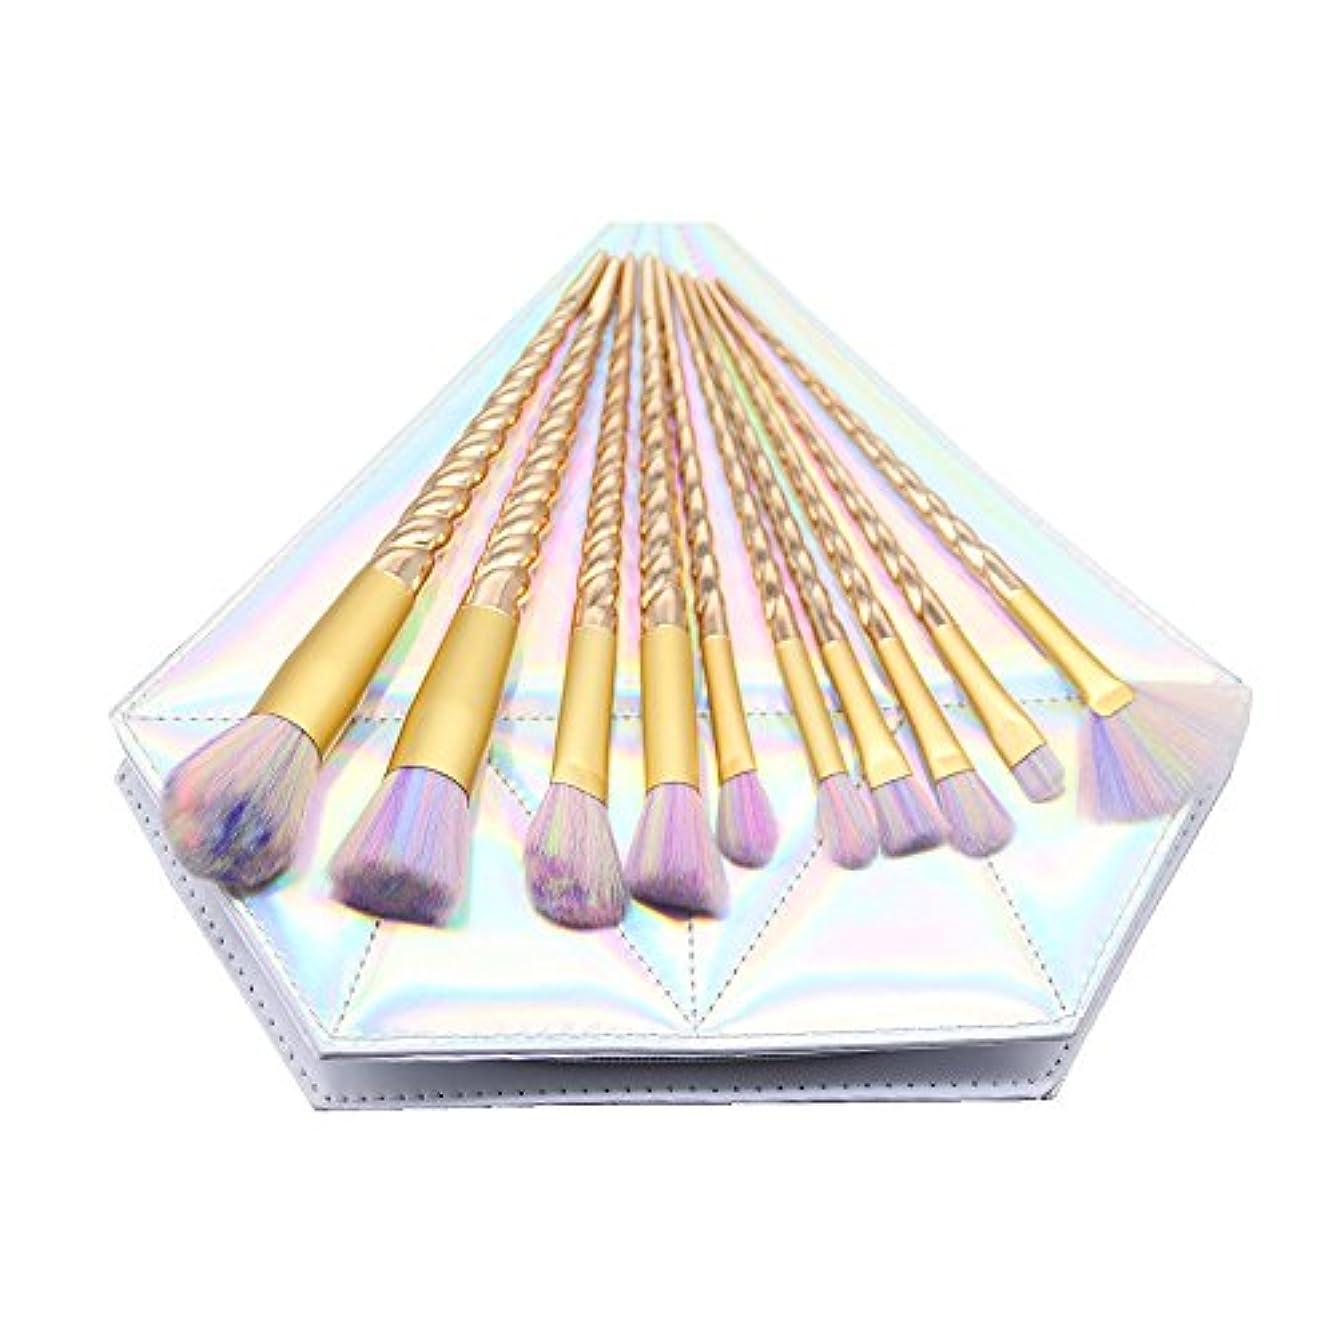 Dilla Beauty メイクブラシセット 10本セット ユニコーンデザイン プラスチックハンドル 合成毛 ファンデーションブラシ アイシャドーブラッシャー 美容ツール 化粧品のバッグ付き